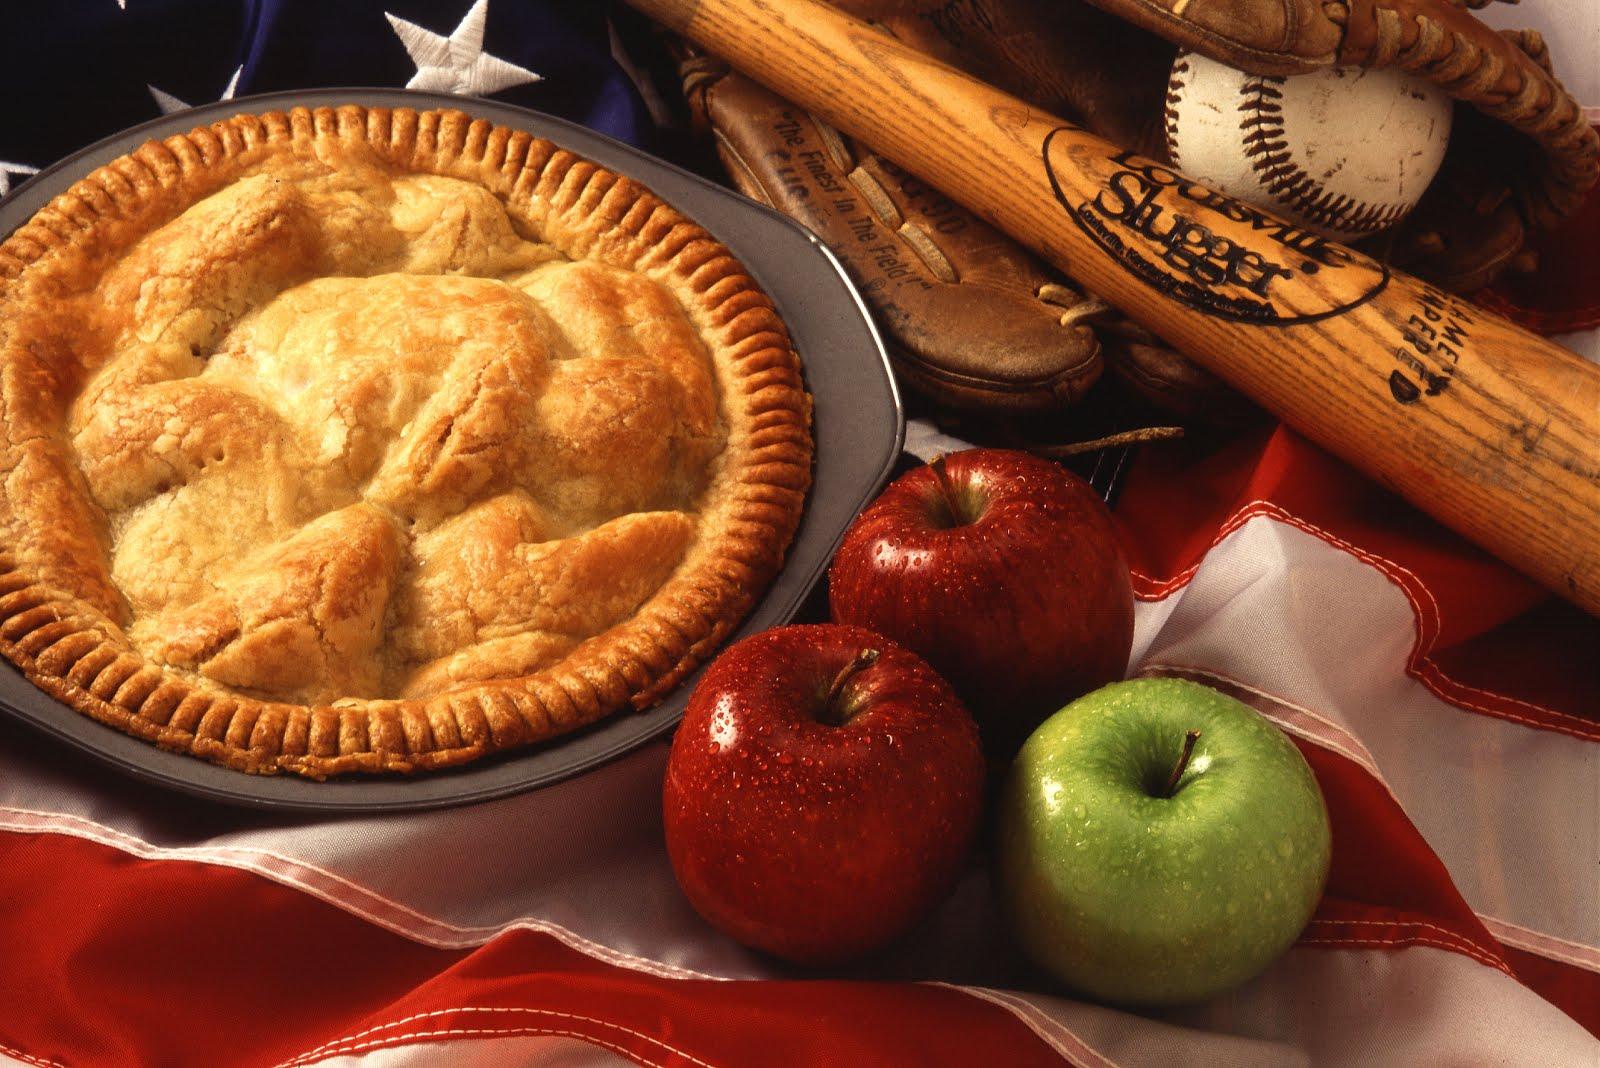 Motherhood_and_apple_pie.jpg